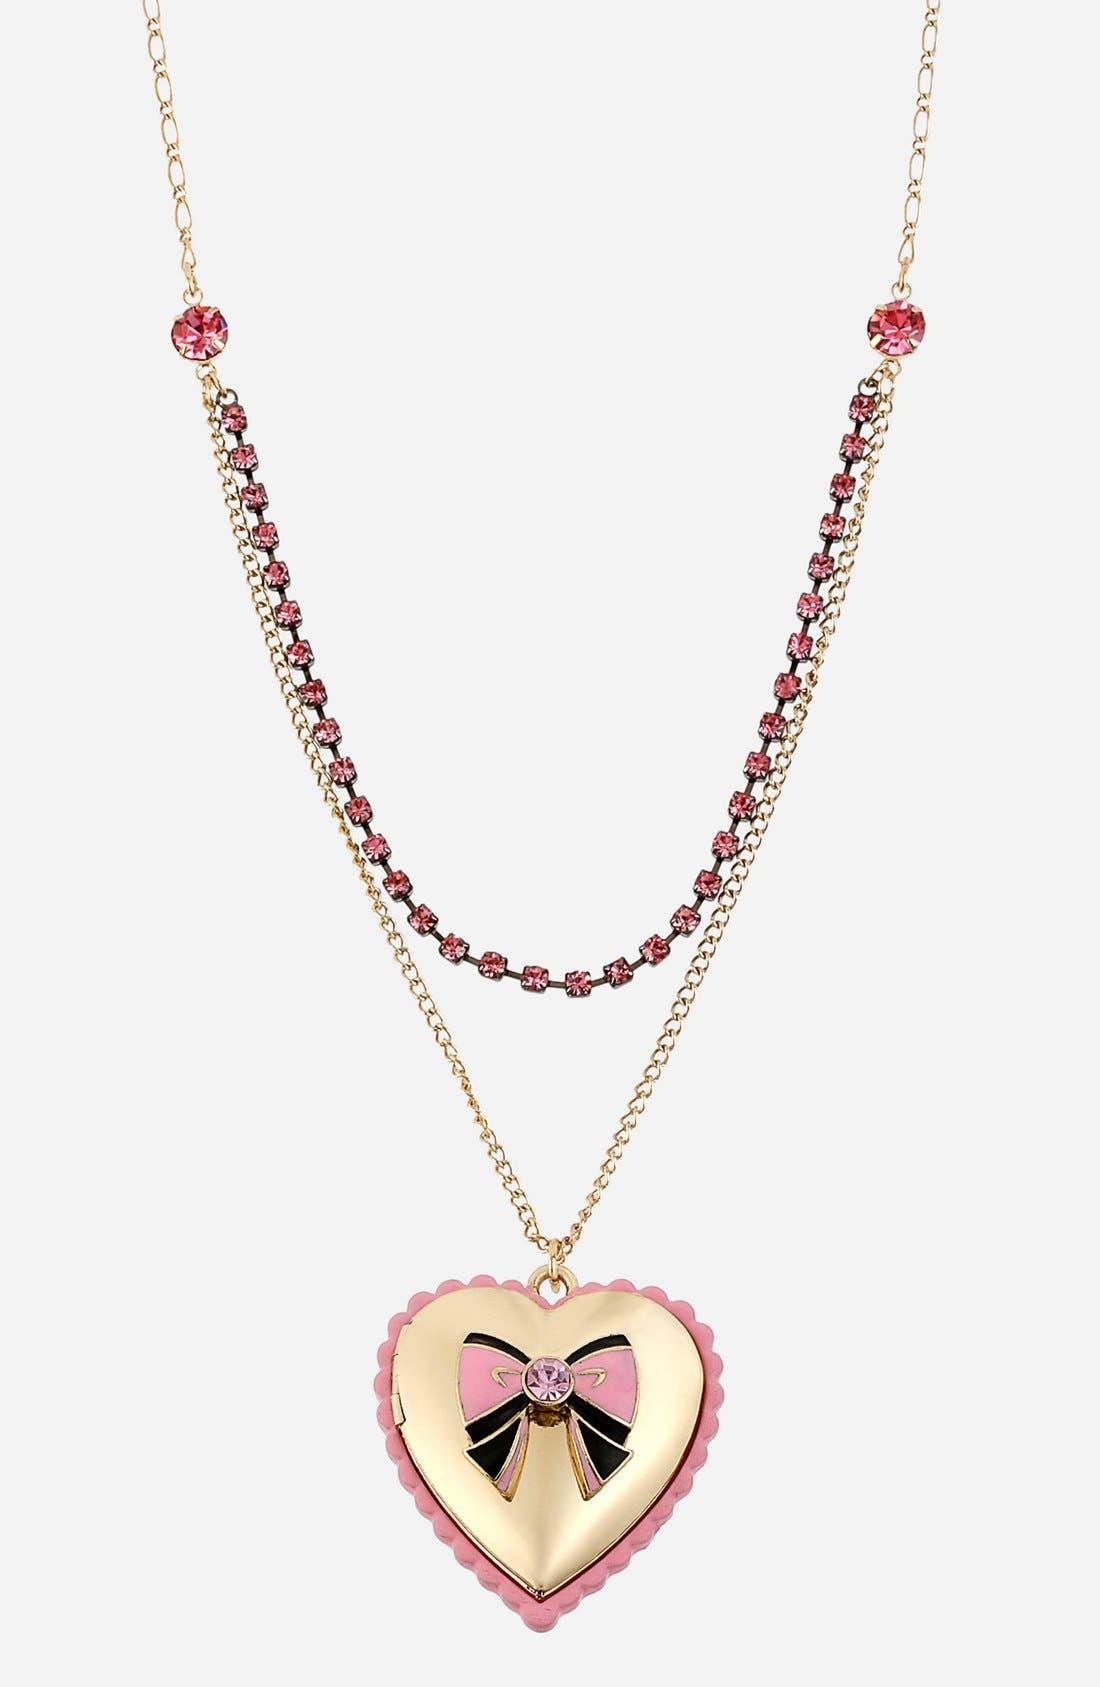 Main Image - Betsey Johnson 'Paris' Heart & Bow Pendant Necklace